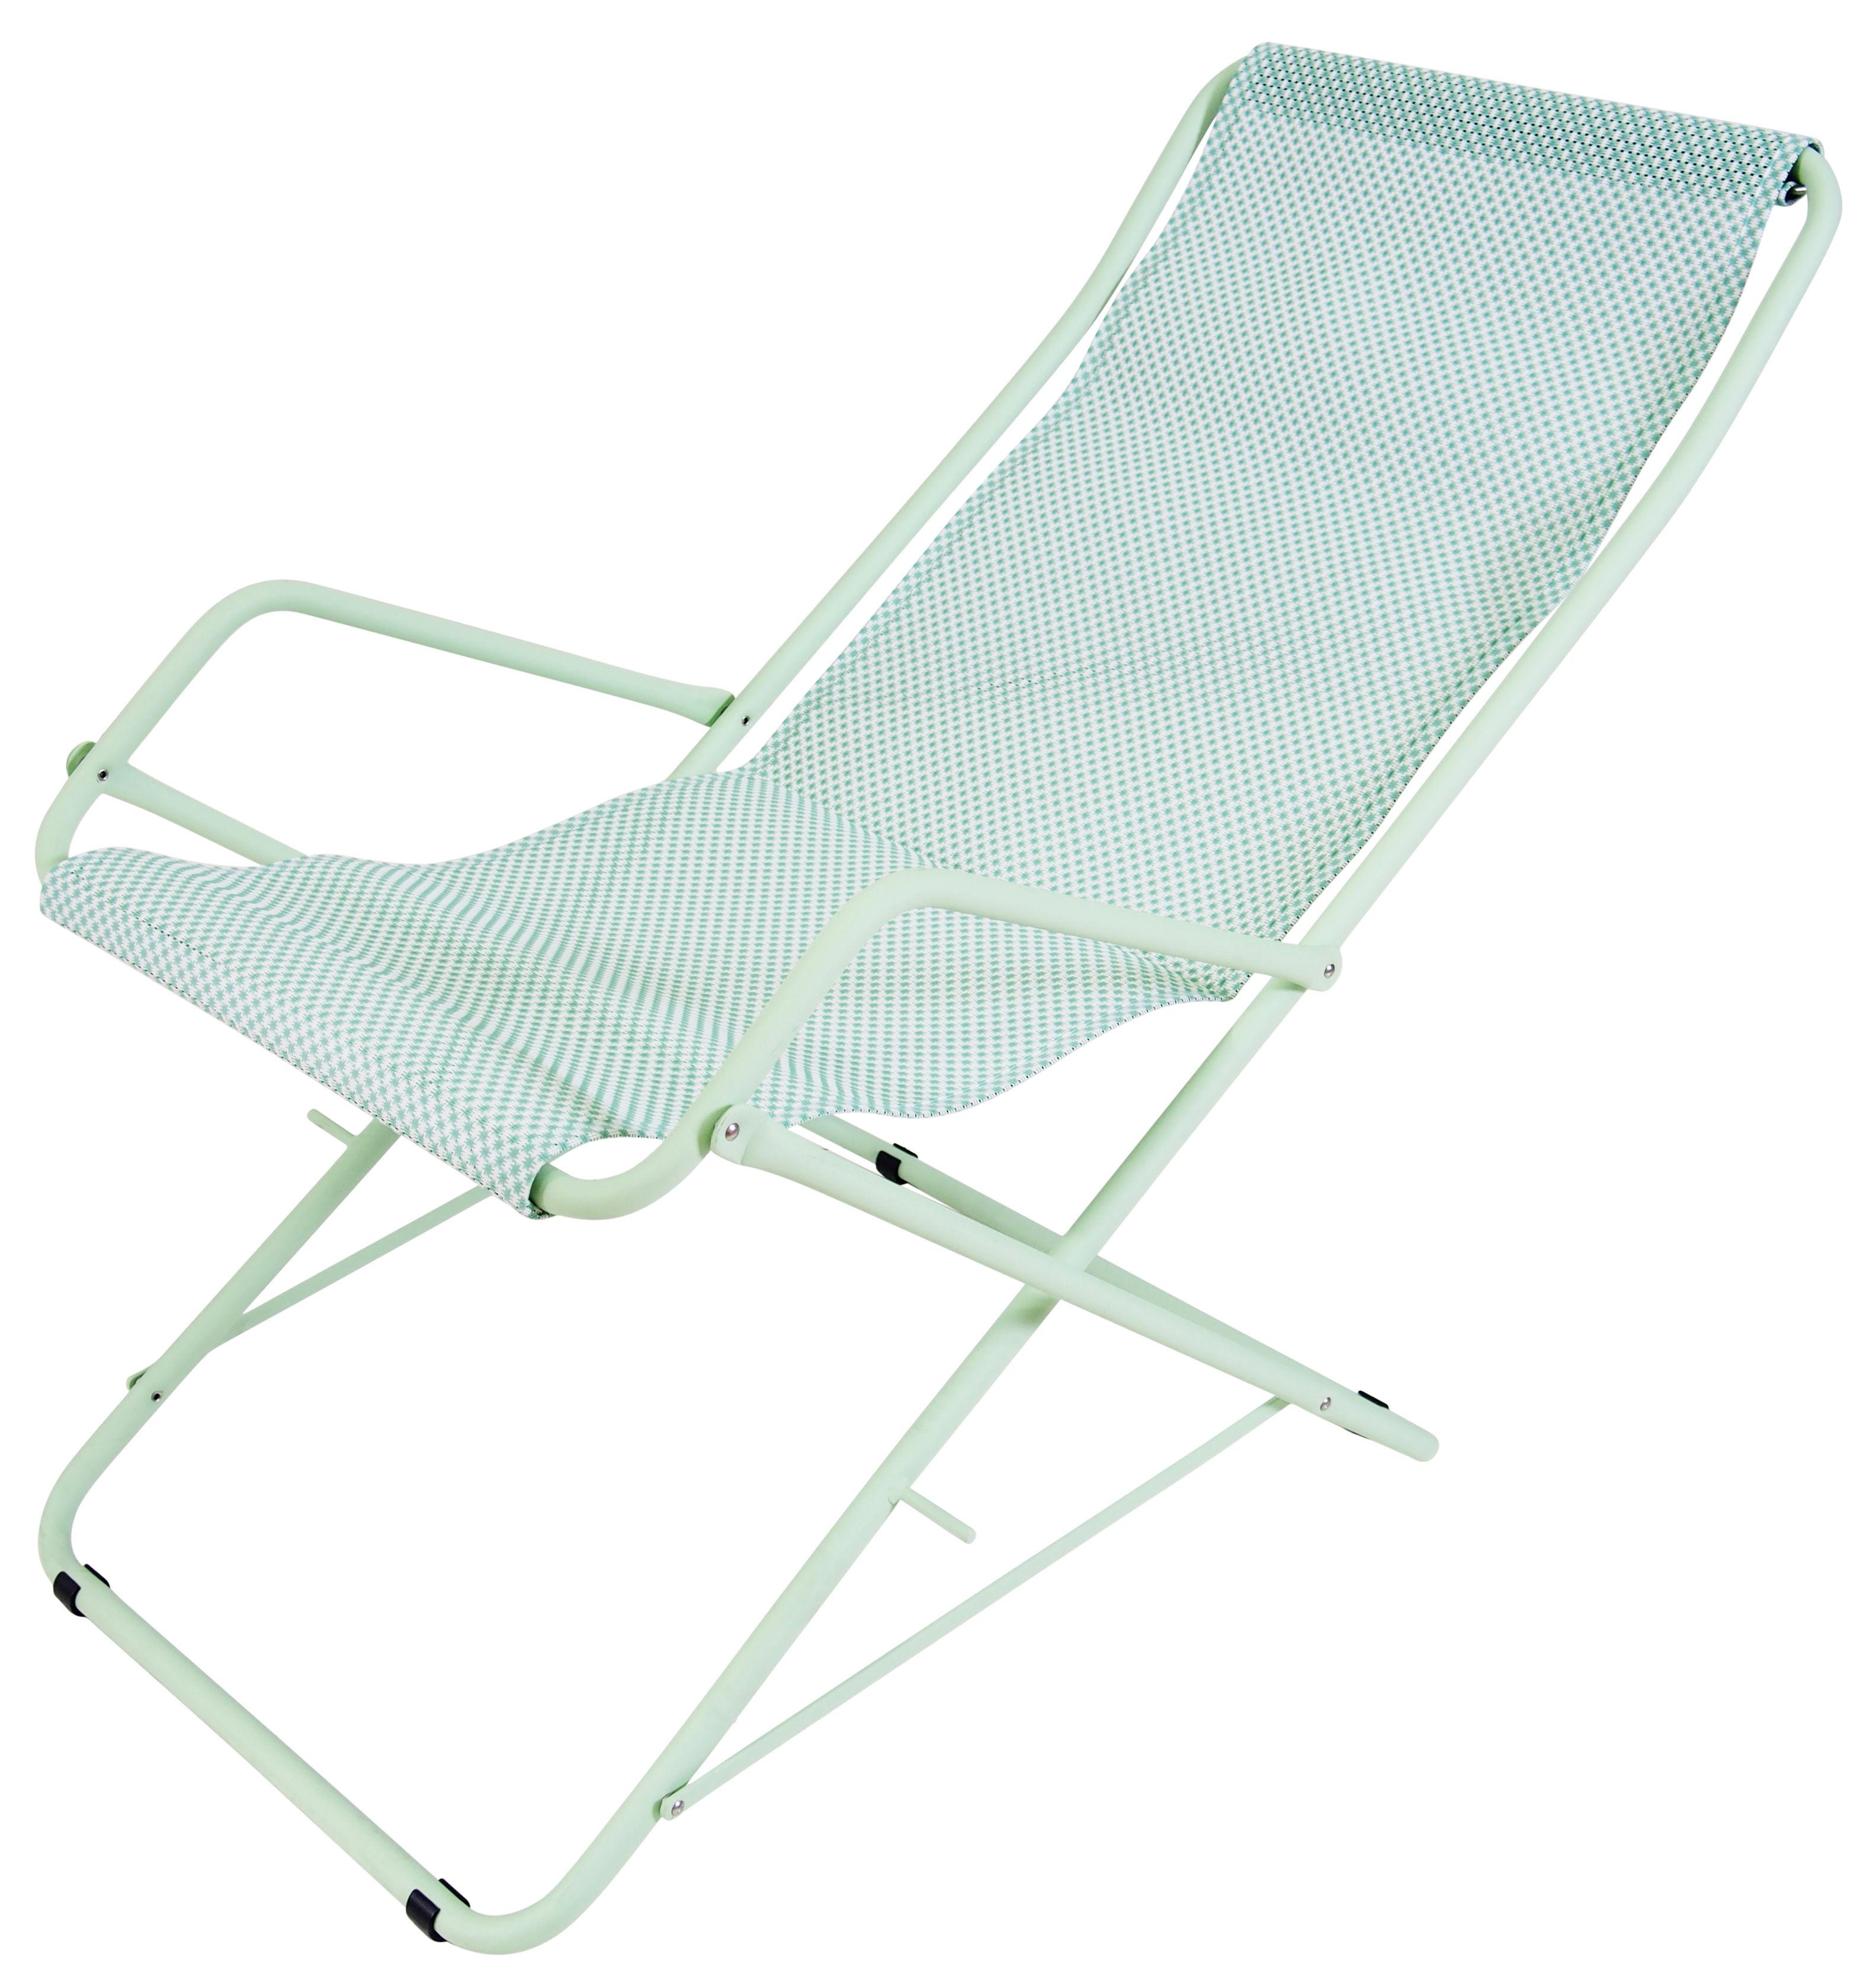 chaise longue bahama pliable toile vert menthe structure verte emu. Black Bedroom Furniture Sets. Home Design Ideas